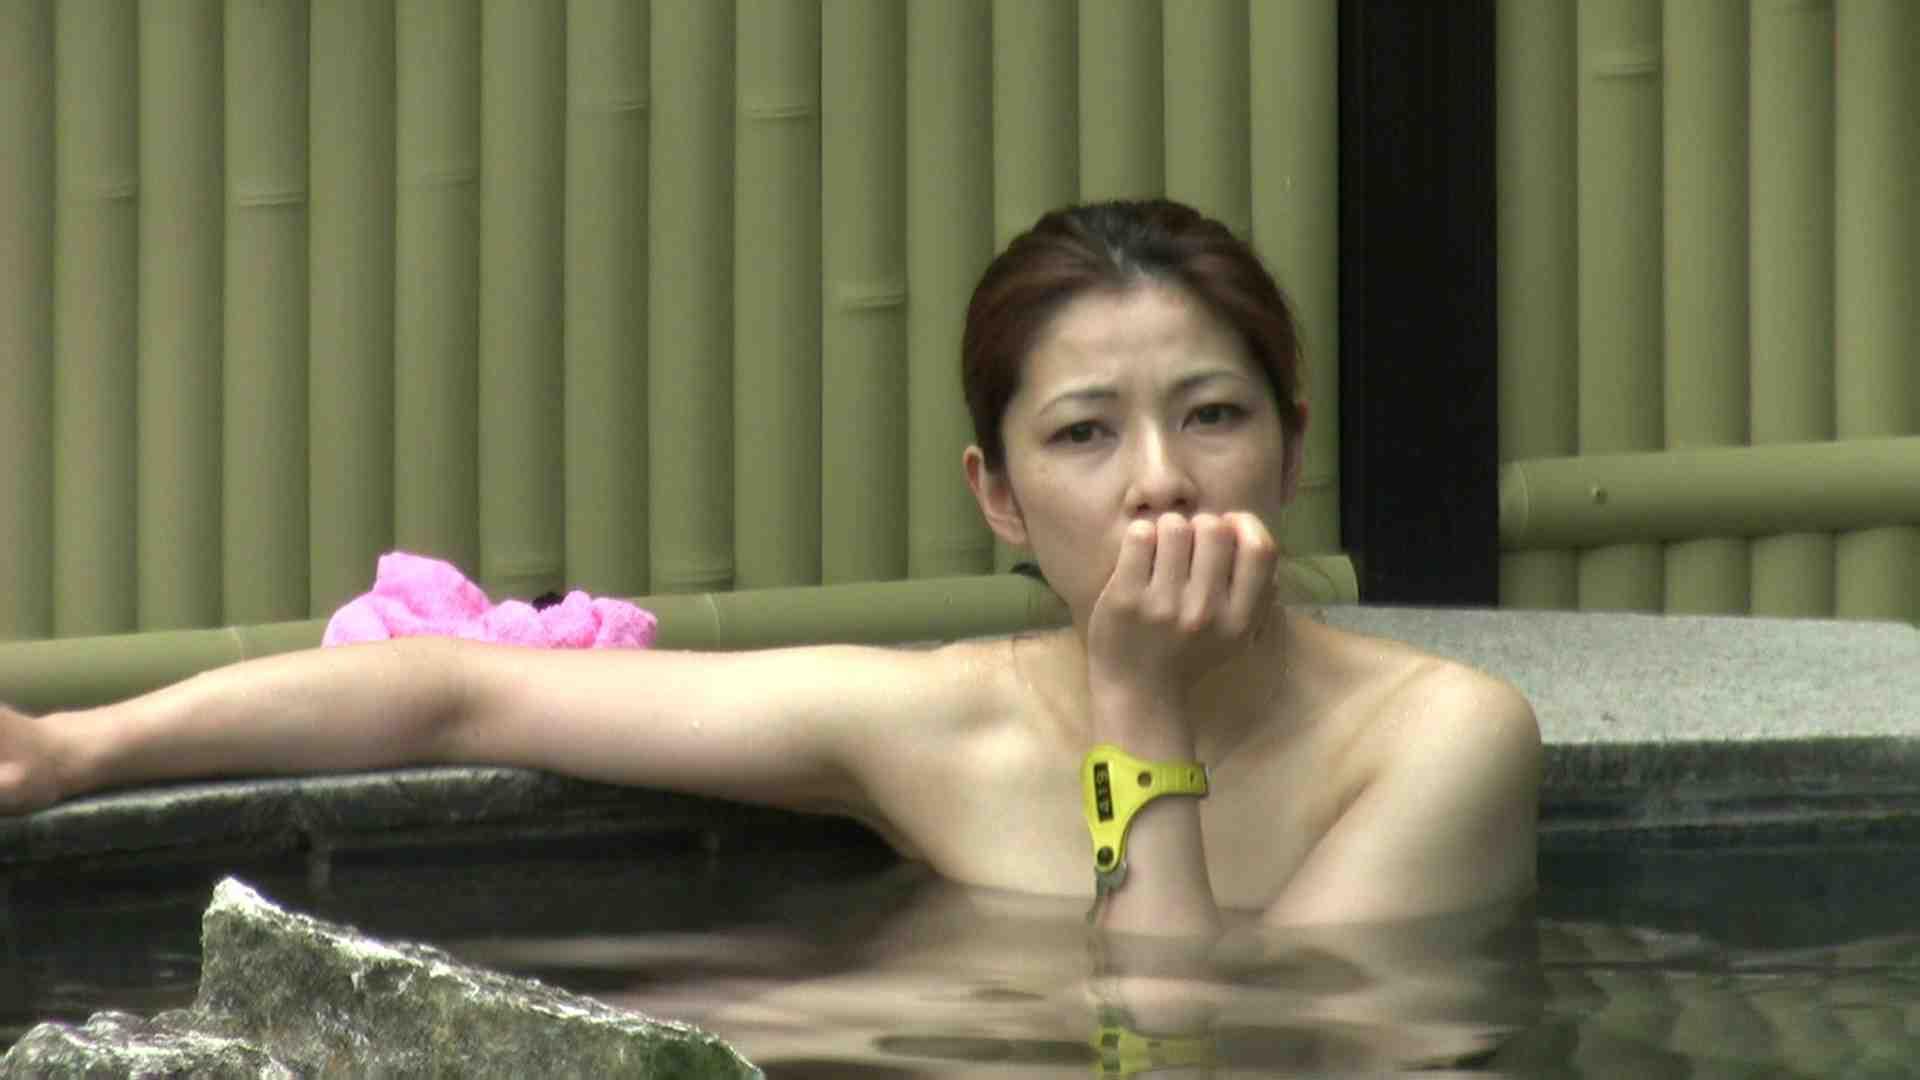 Aquaな露天風呂Vol.660 露天   OL女体  59連発 28